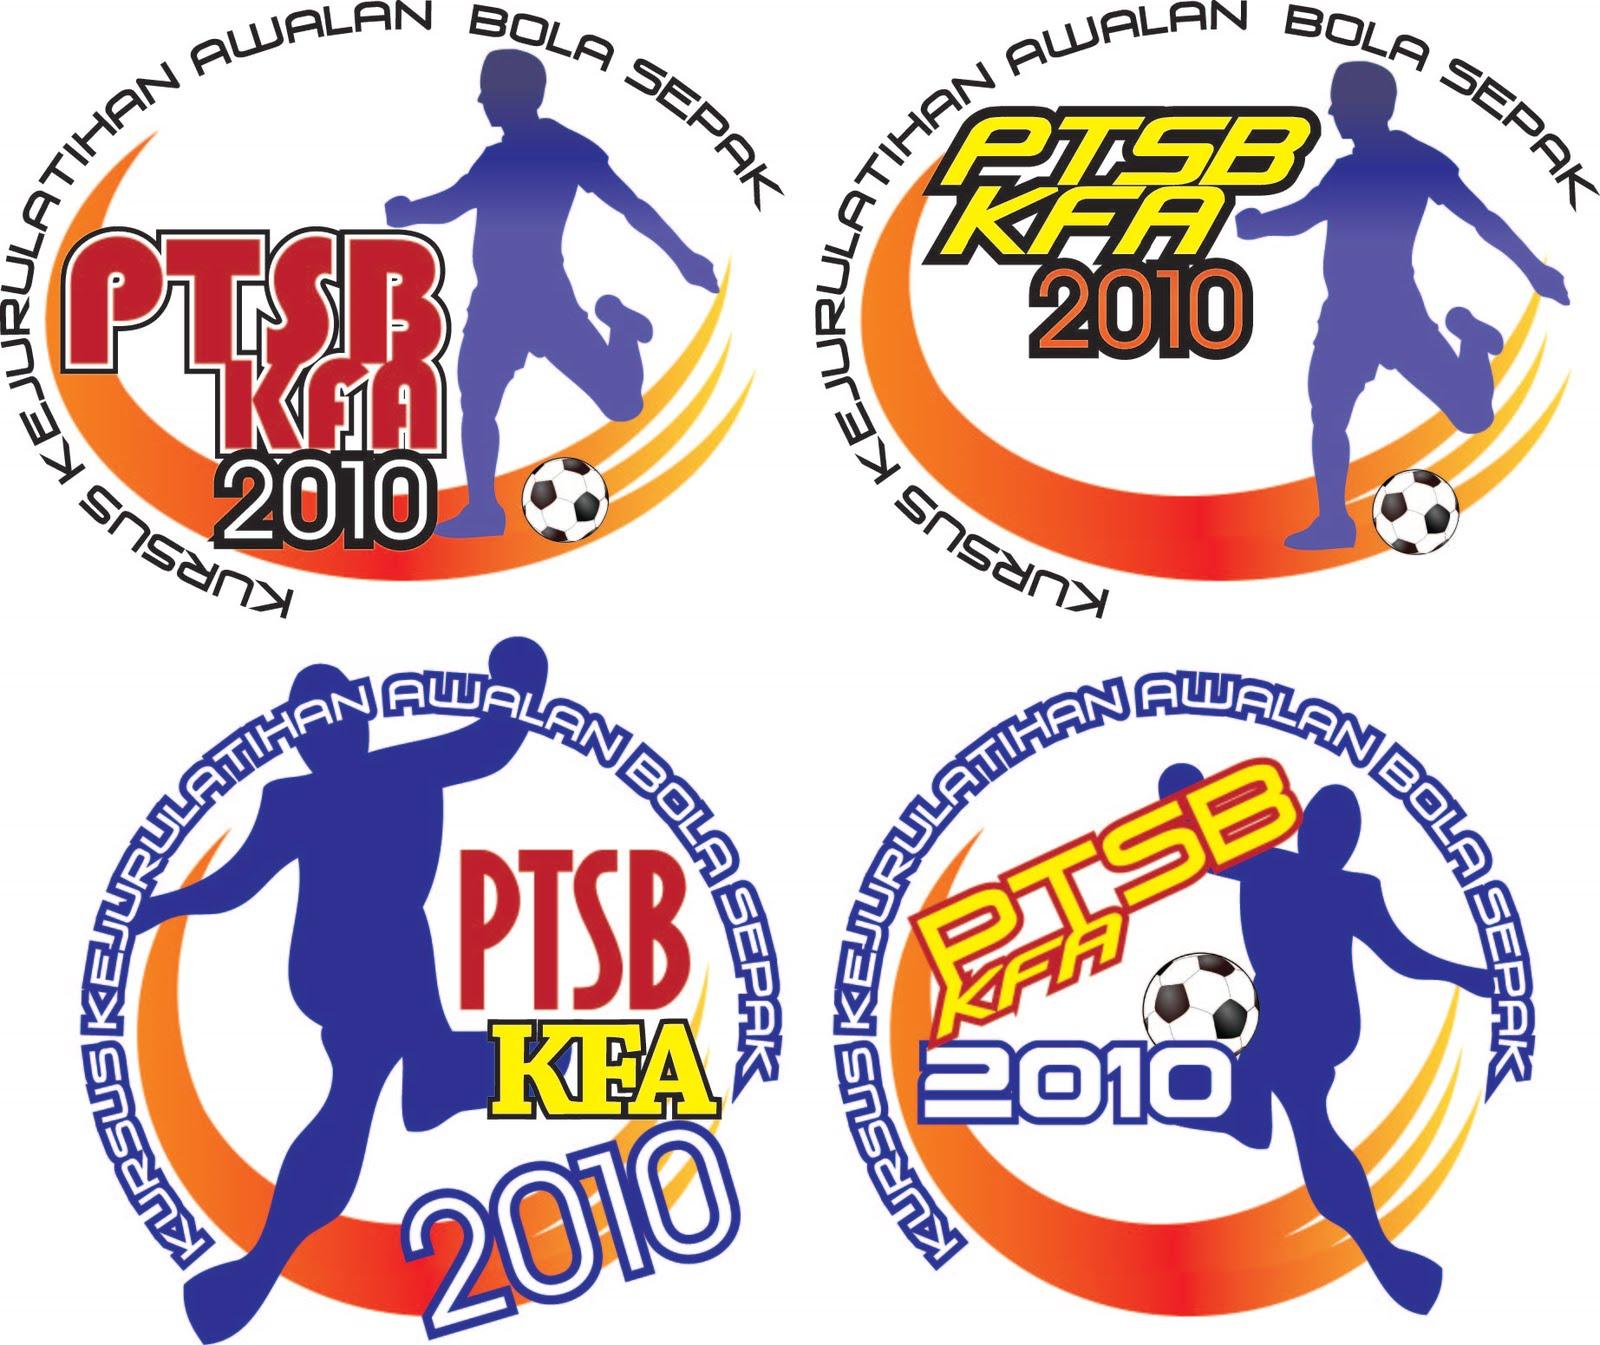 kelab bolasepak ptsb ptsb fc october 2010